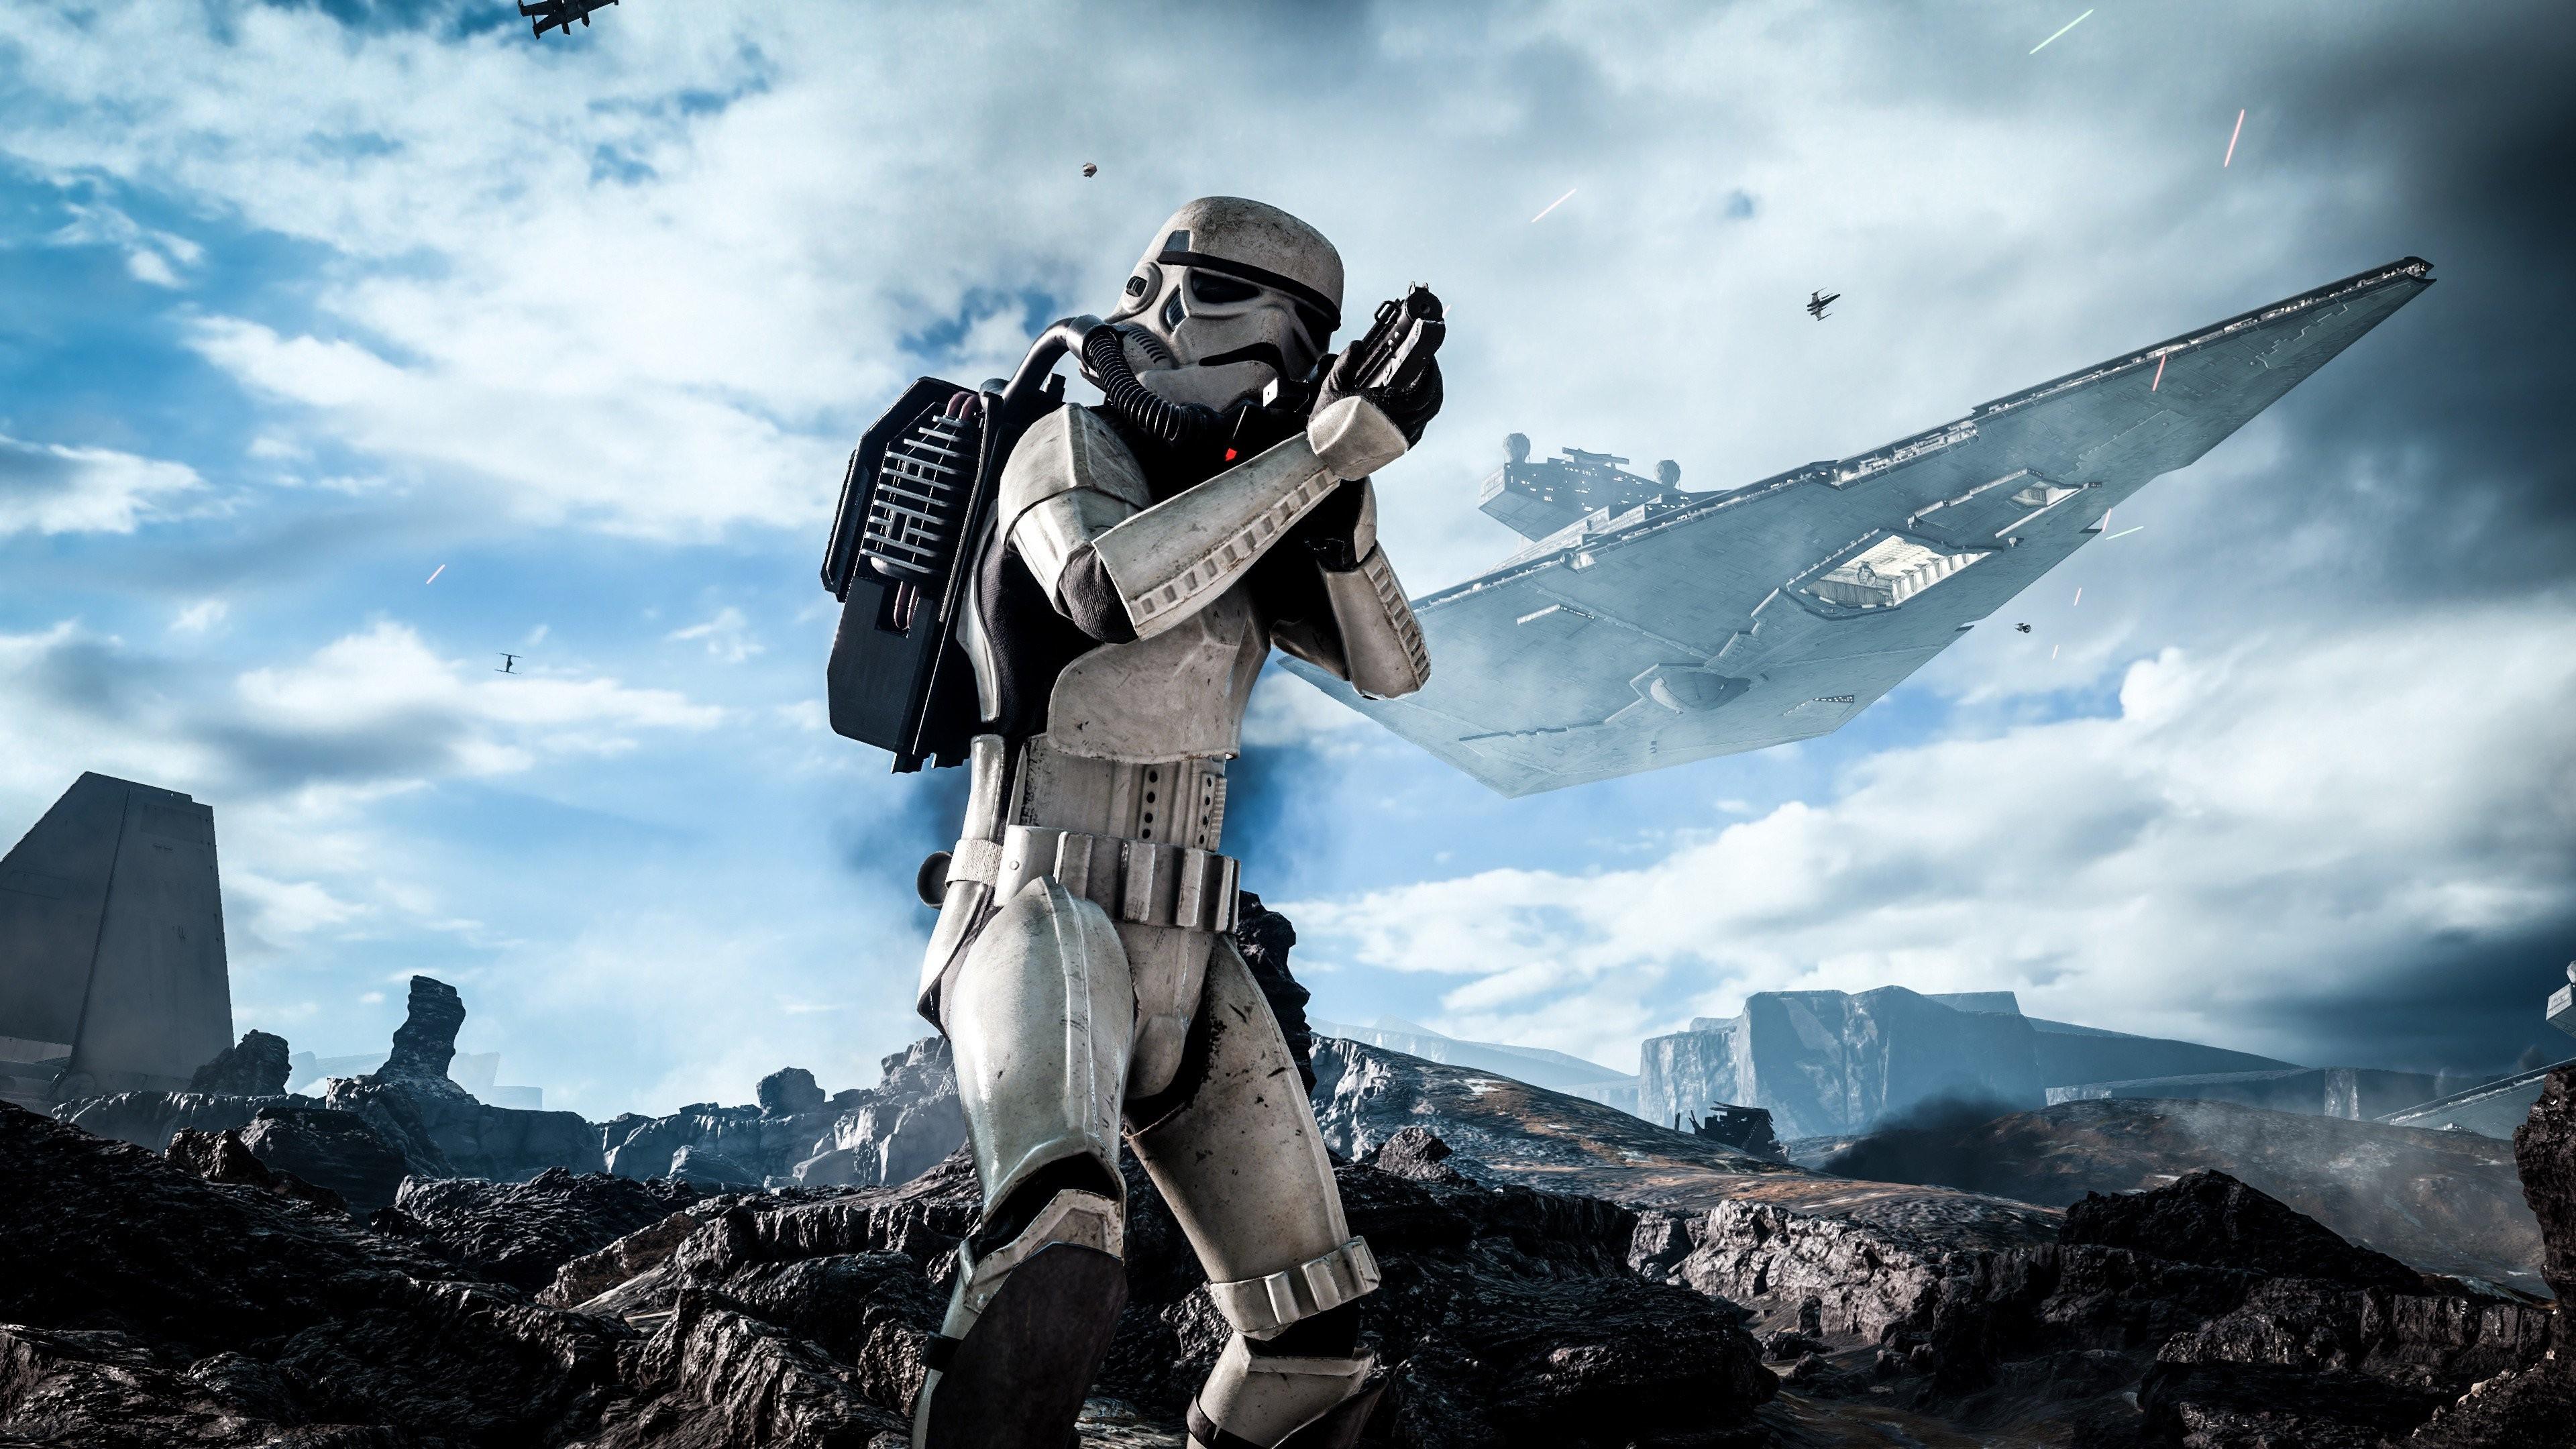 First Order Stormtrooper Wallpaper 1 Download Free